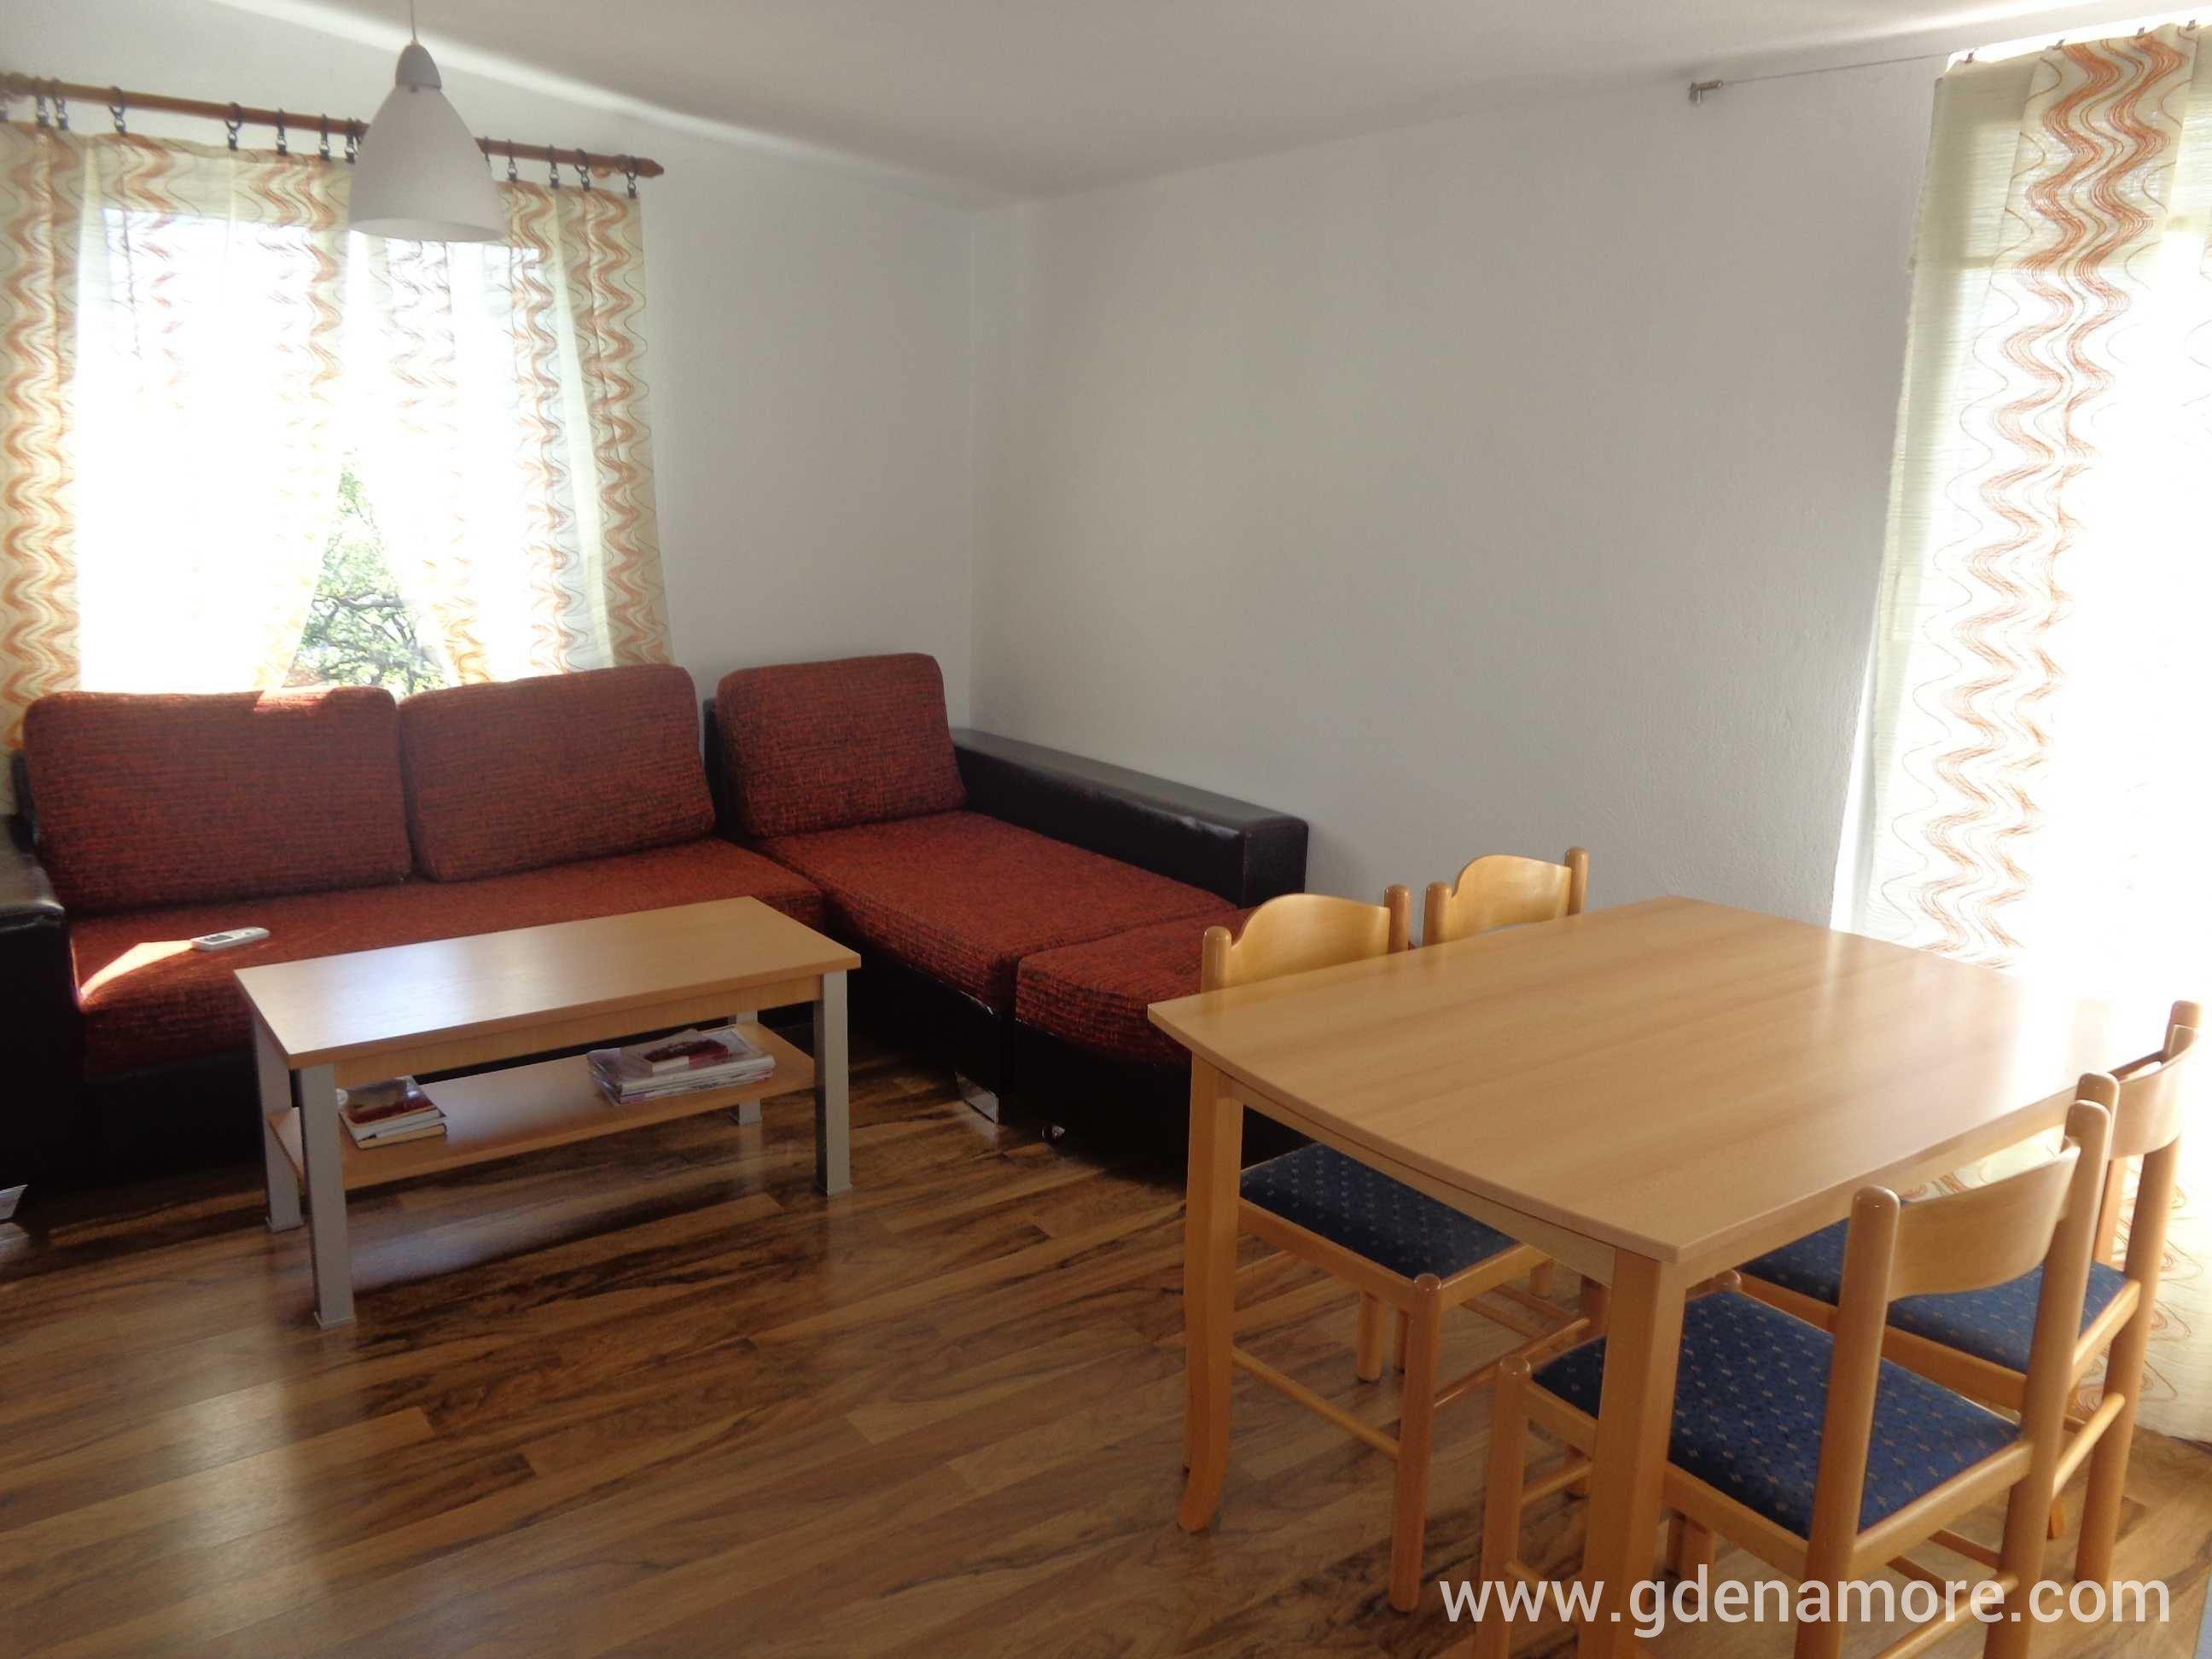 Privatan smeštaj sprat kuce (4 spavace sobe) u mestu Sutomore, Crna Gora  Gd...